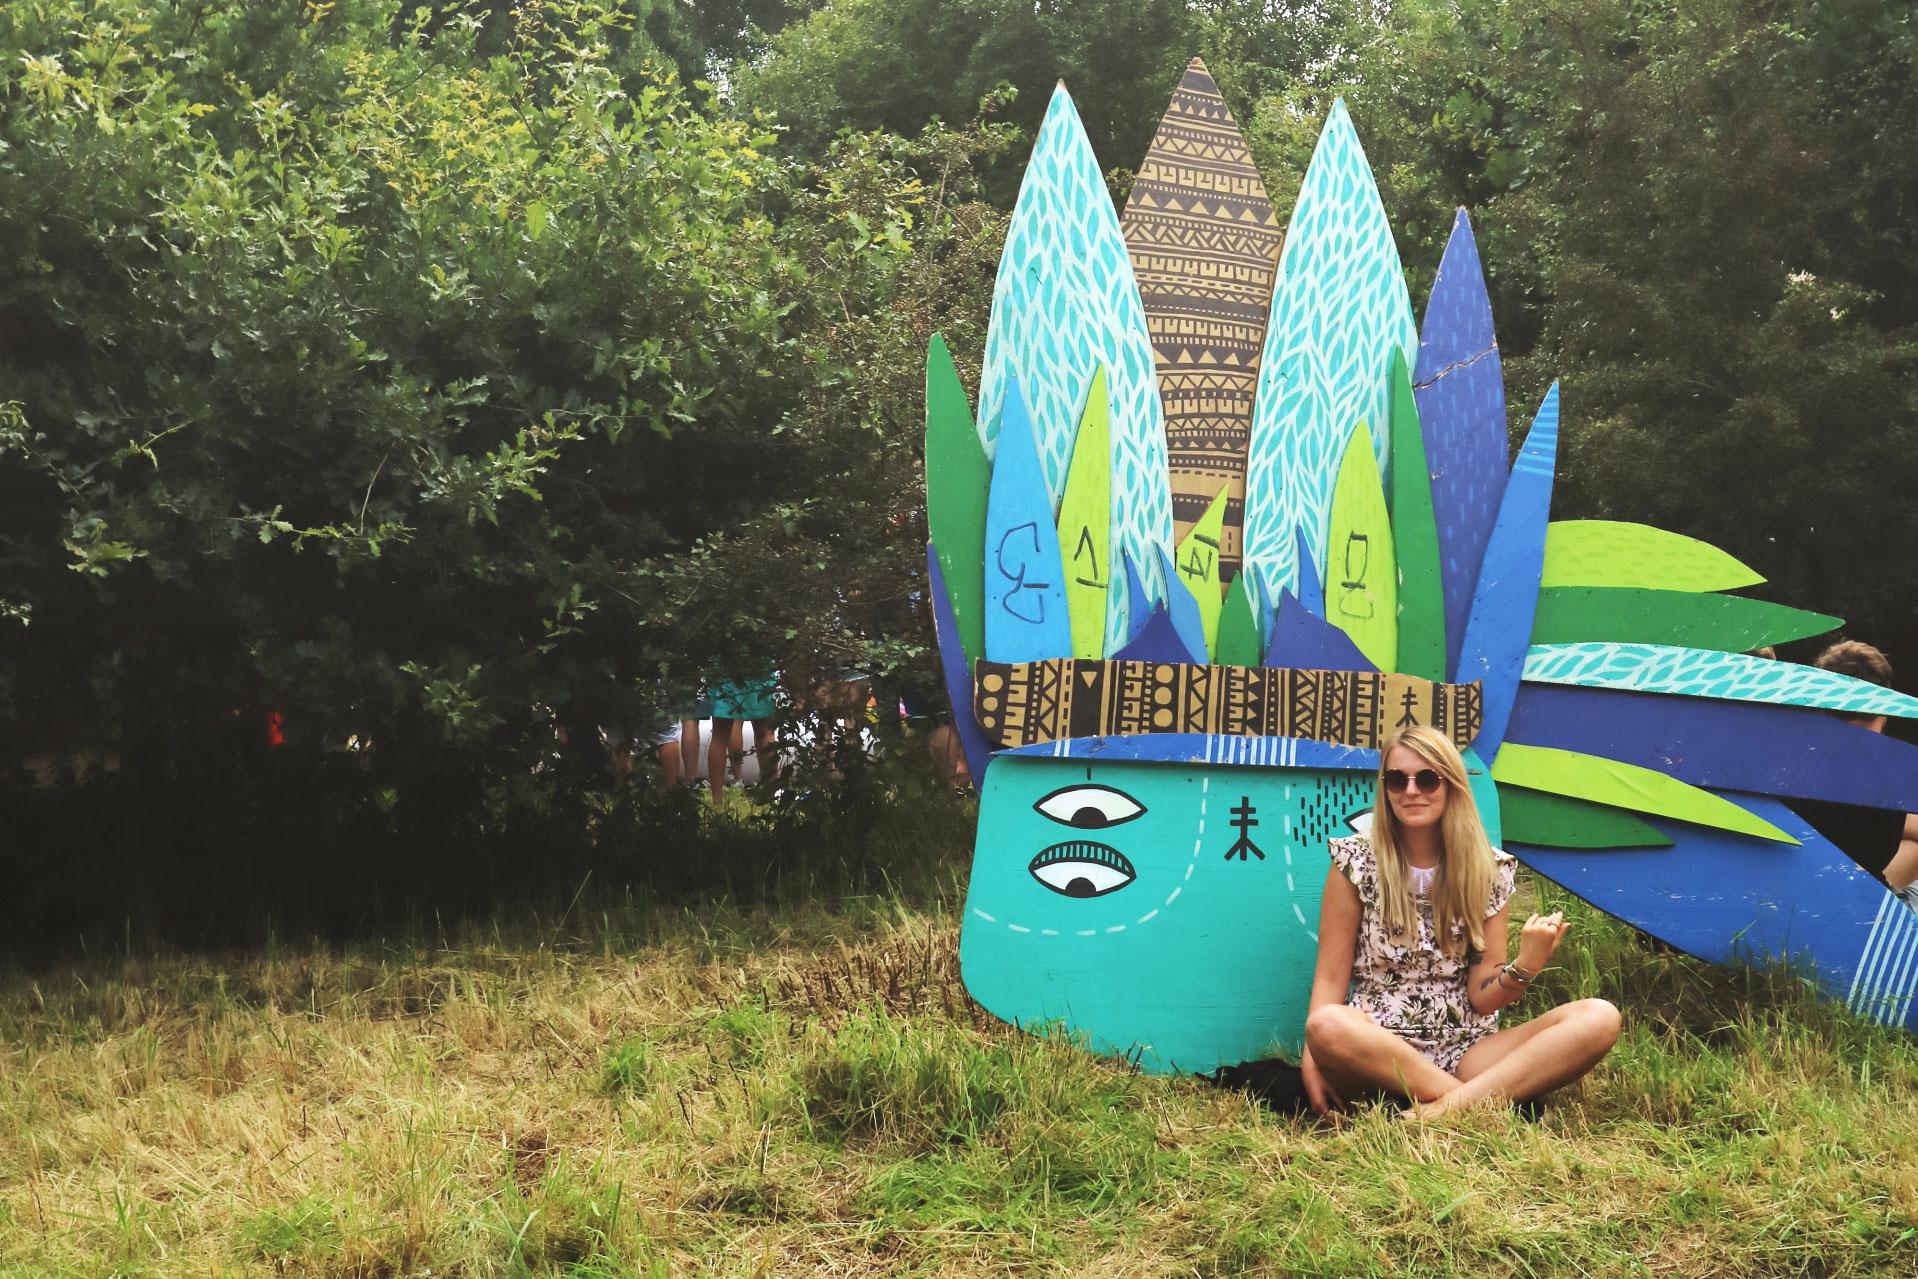 pangea-festival-2017-fitness-lifestyle-blog-fitnessblogger-deutsch-turnschuhverliebt_3